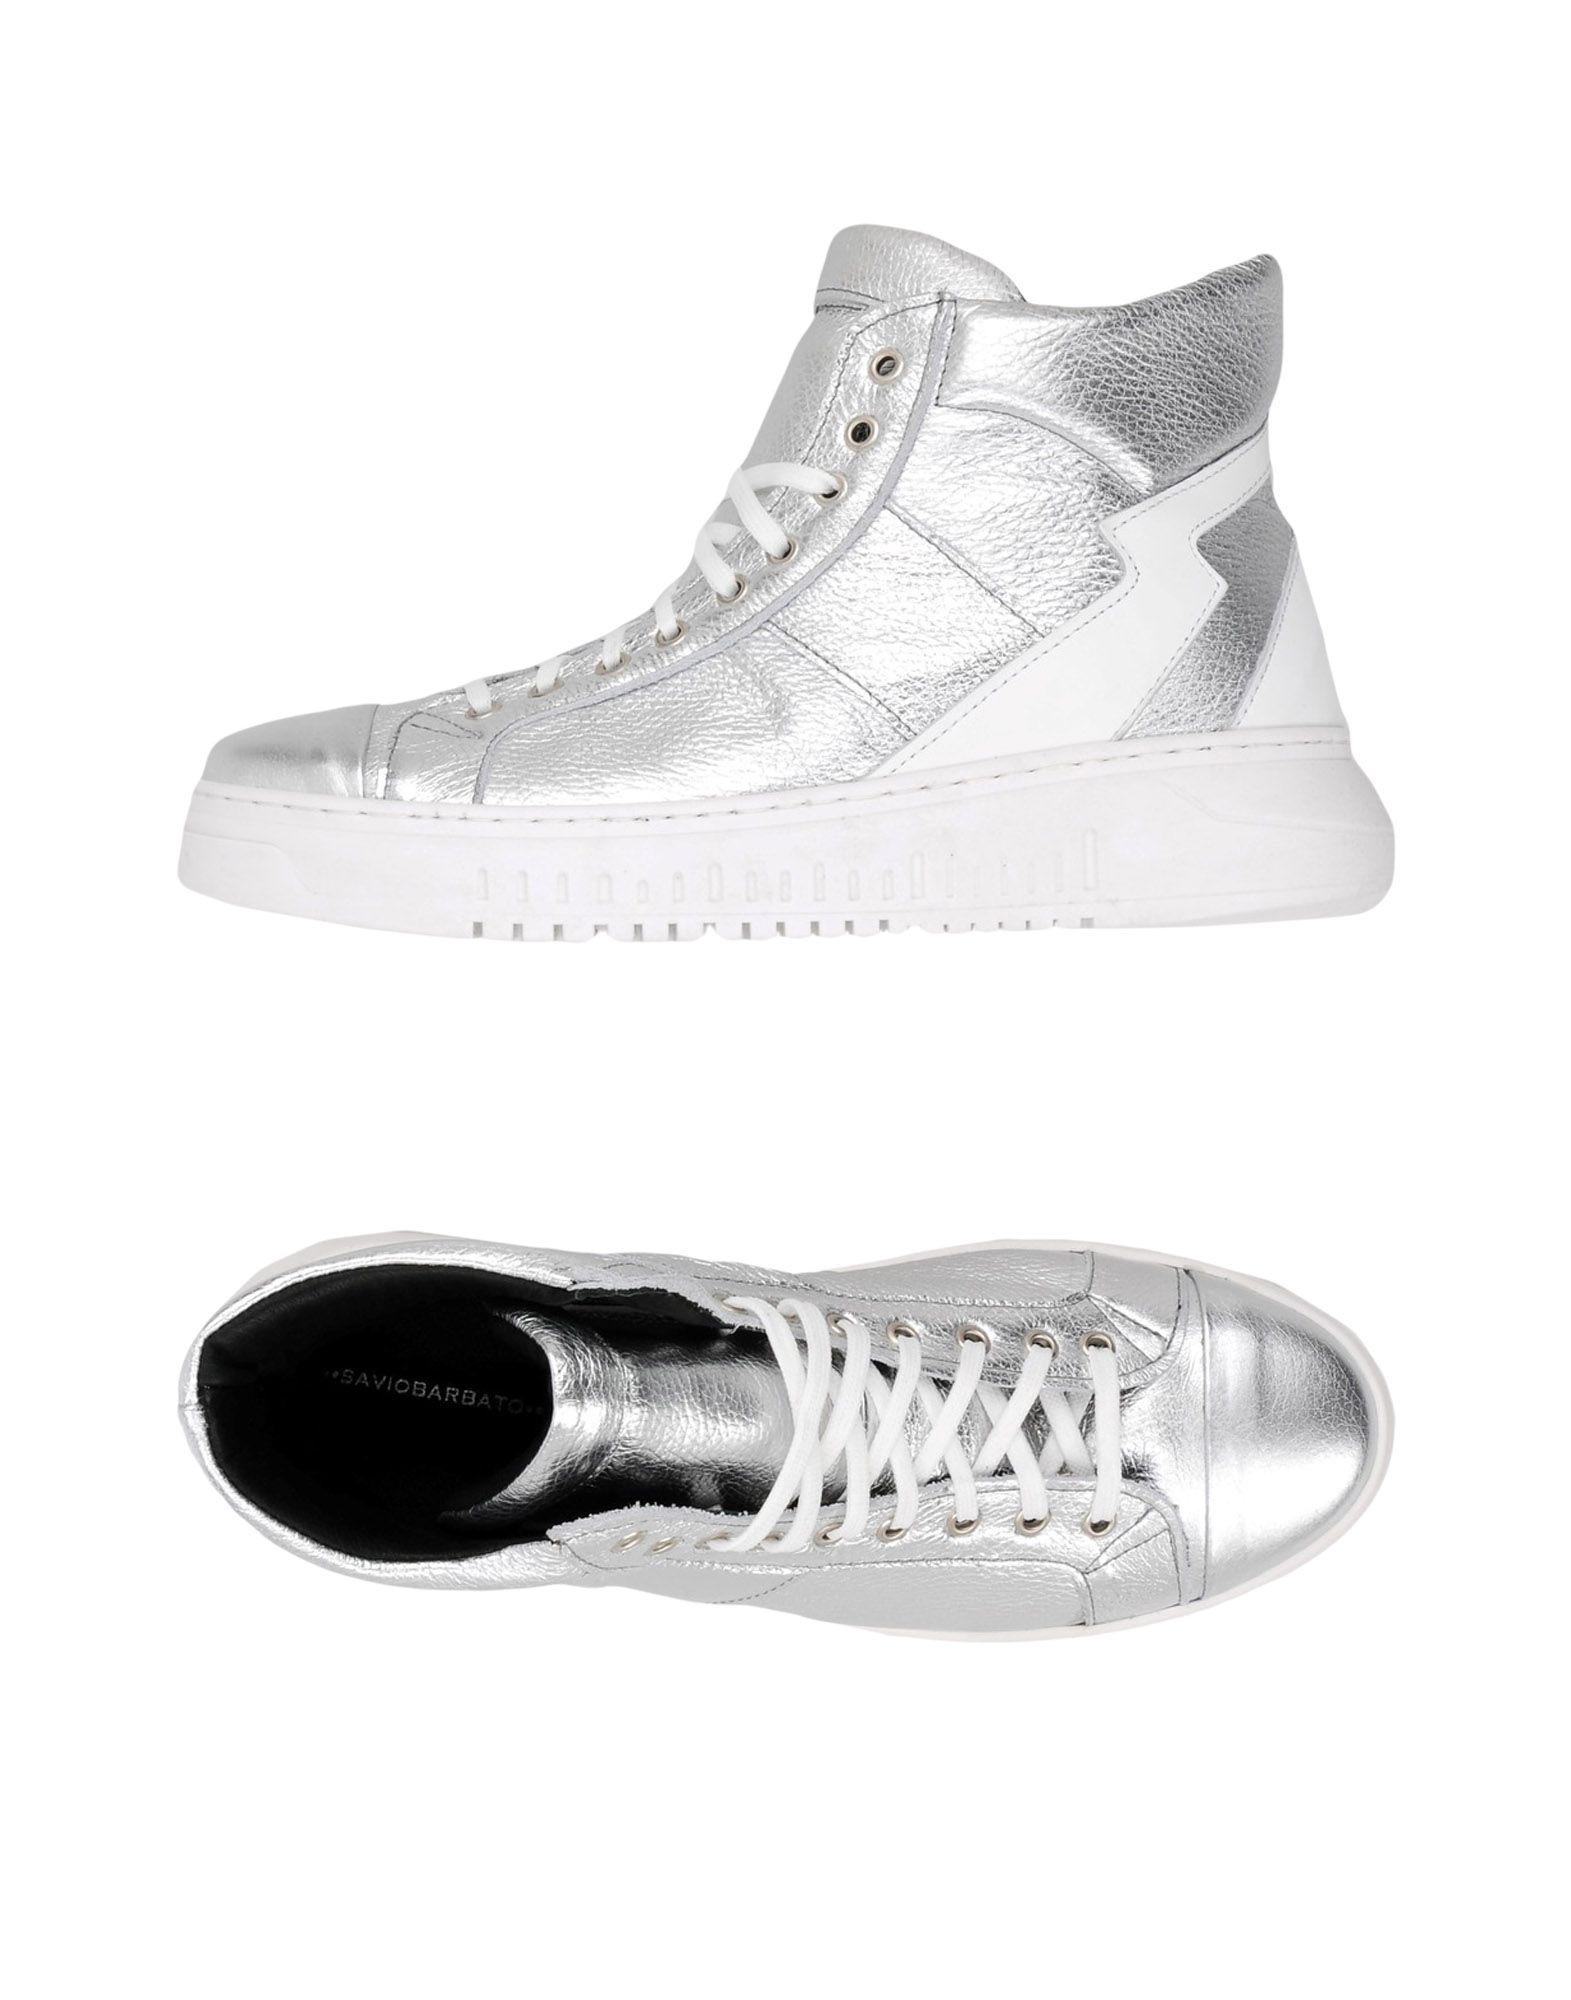 Sneakers Savio Barbato Homme - Sneakers Savio Barbato  Argent Meilleur modèle de vente